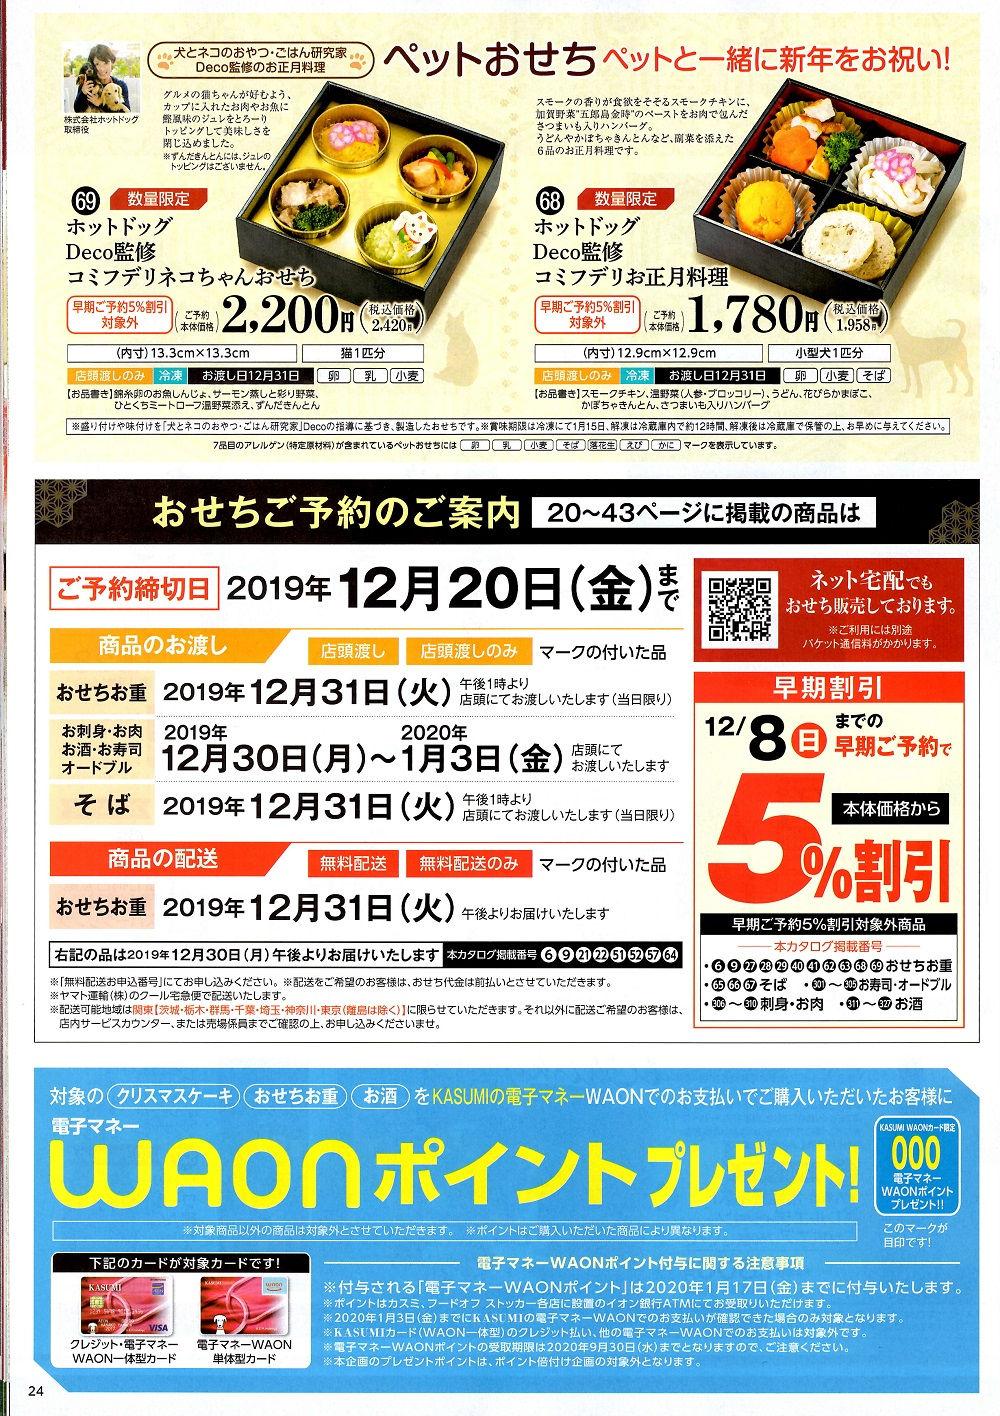 KASUMI(カスミ)三里塚店の『おせち』パンフレット(お届け予定等)